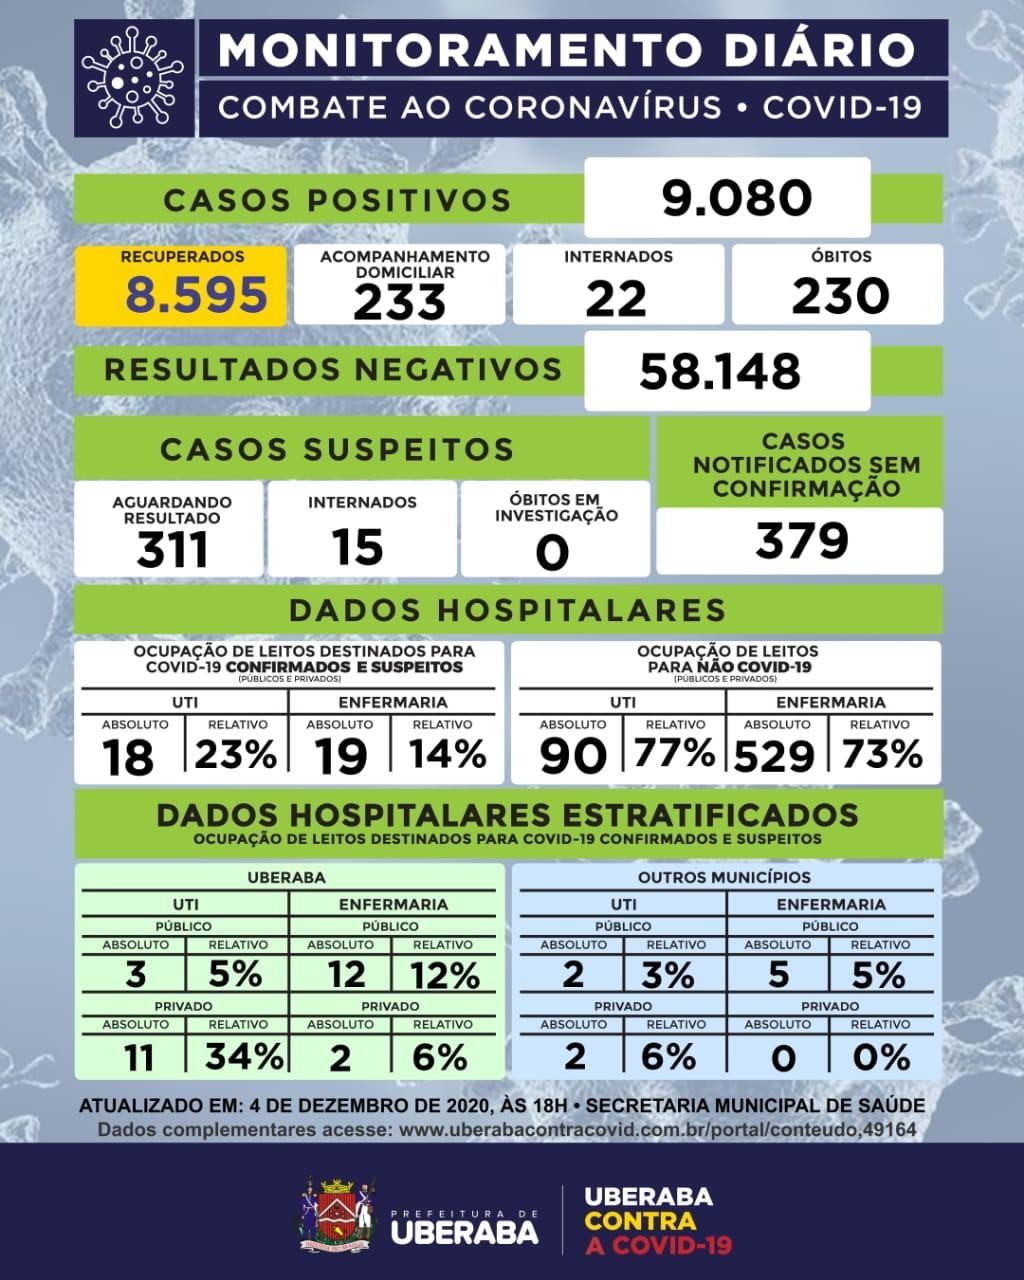 Uberaba atinge 230 mortes causadas pela Covid-19